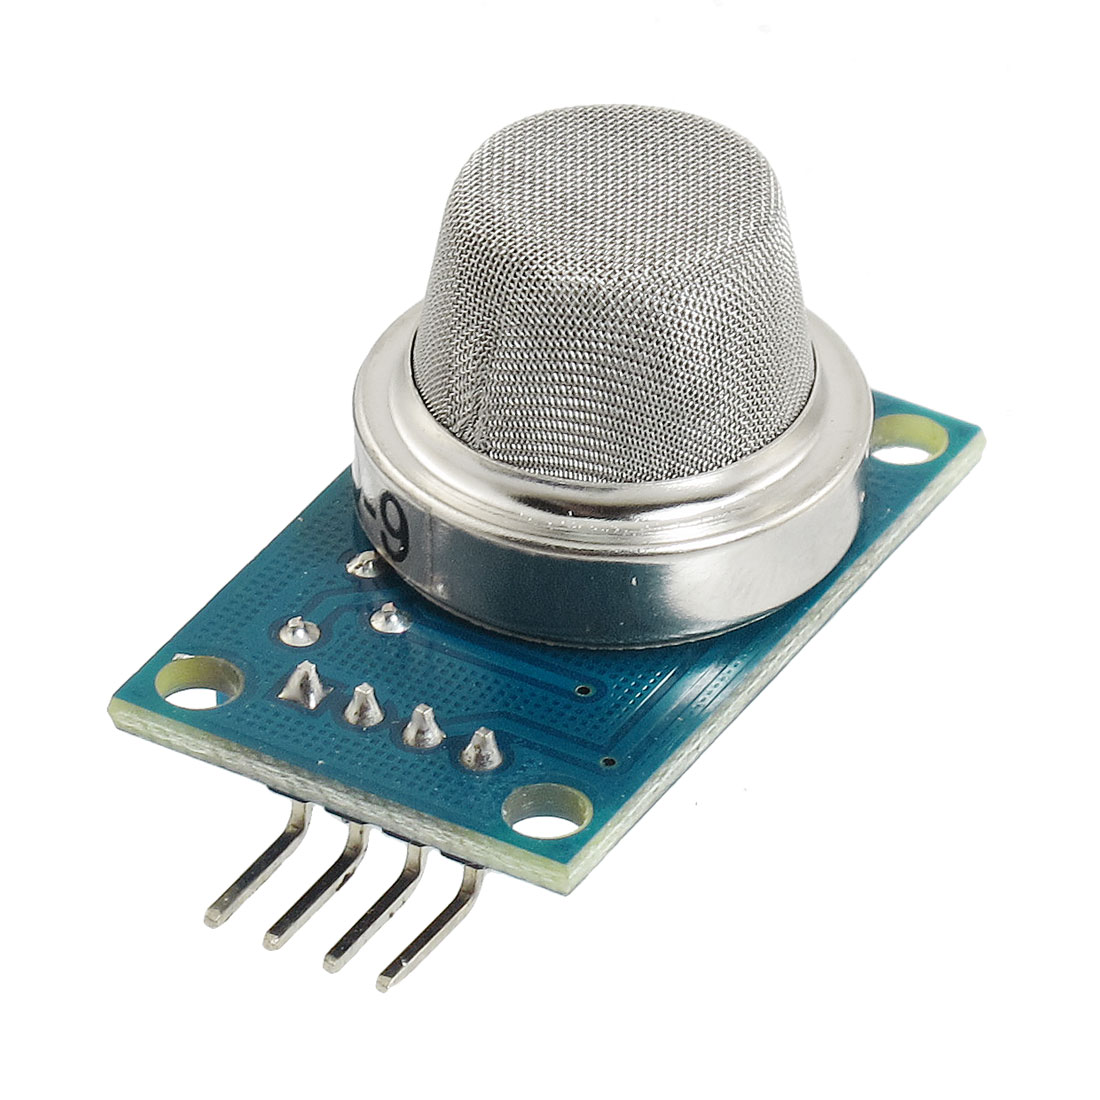 DC 3-5V 10-1000ppm Carbonic Oxide Gas Sensor Module Detector MQ-9